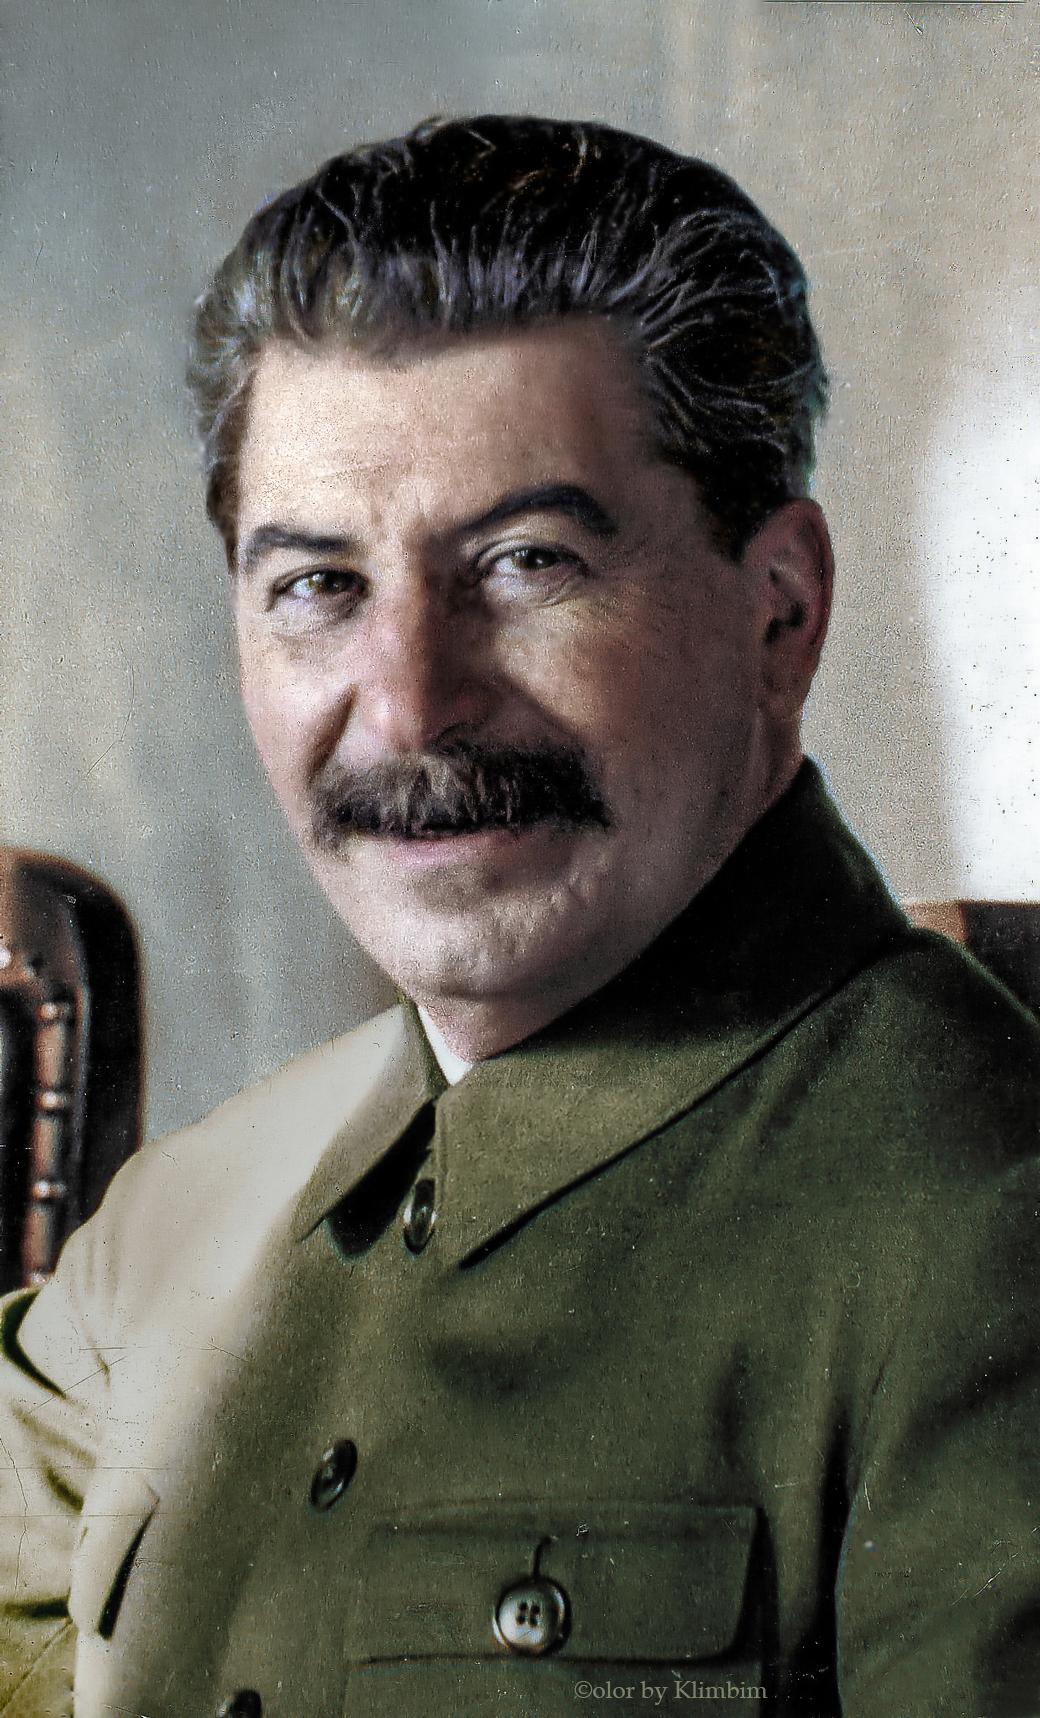 Joseph-Stalin-1932-color.jpg